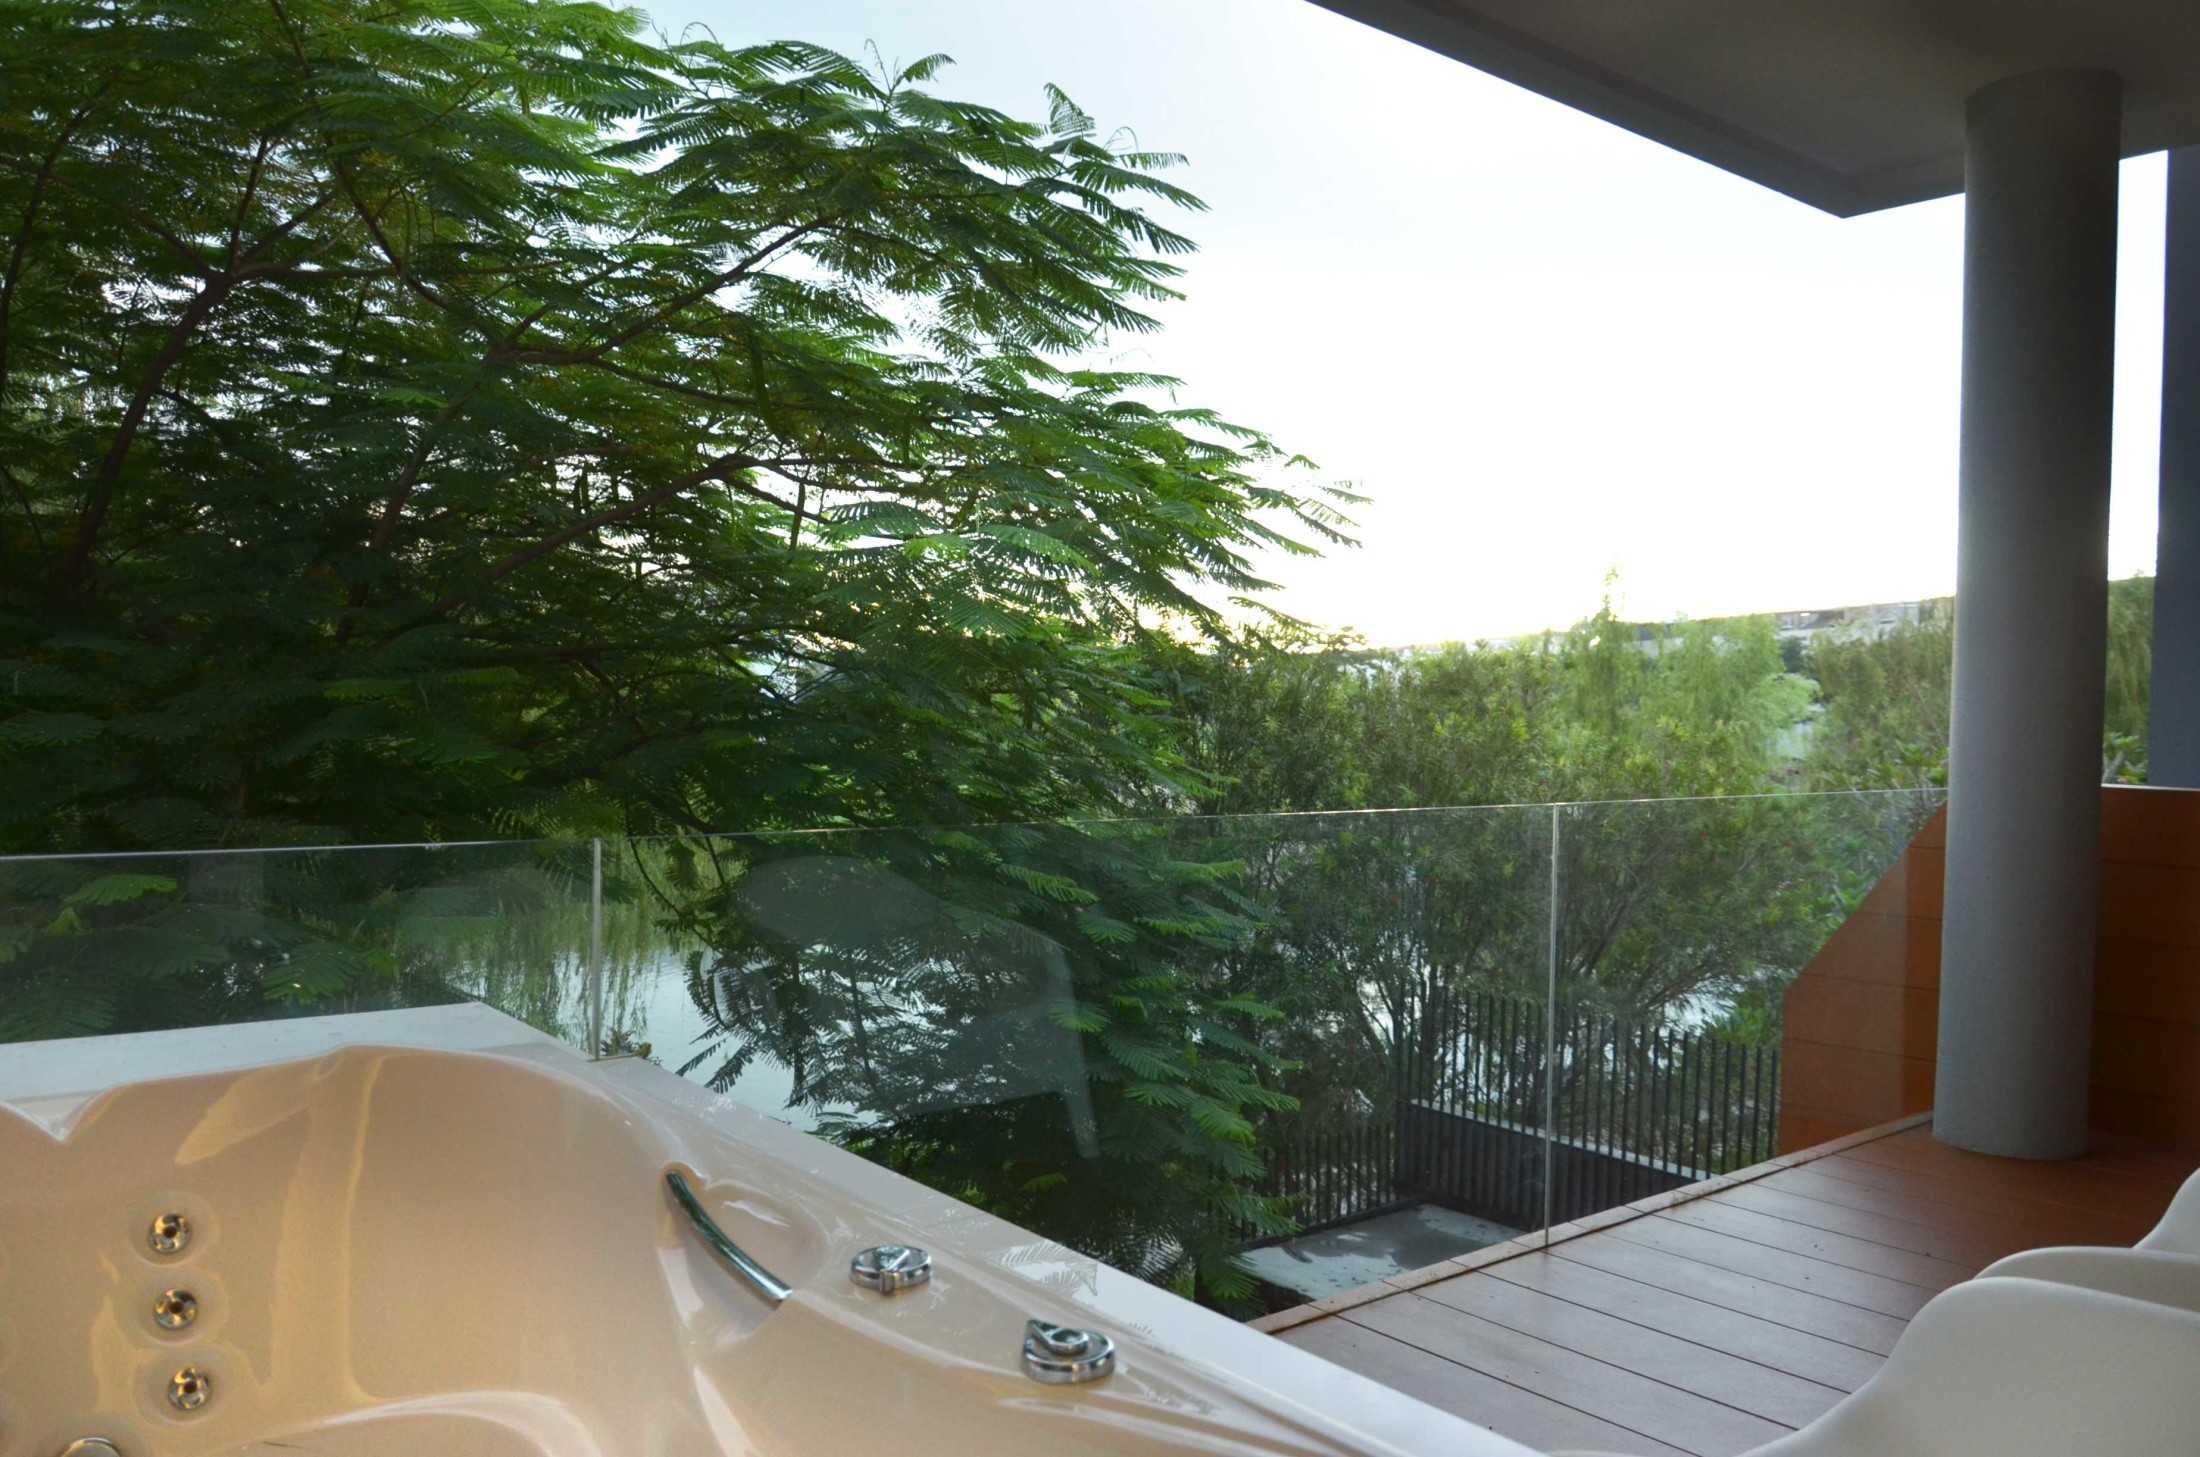 Atelier Ara G House Tangerang, Banten, Indonesia  Atelier-Ara-G-House  69154